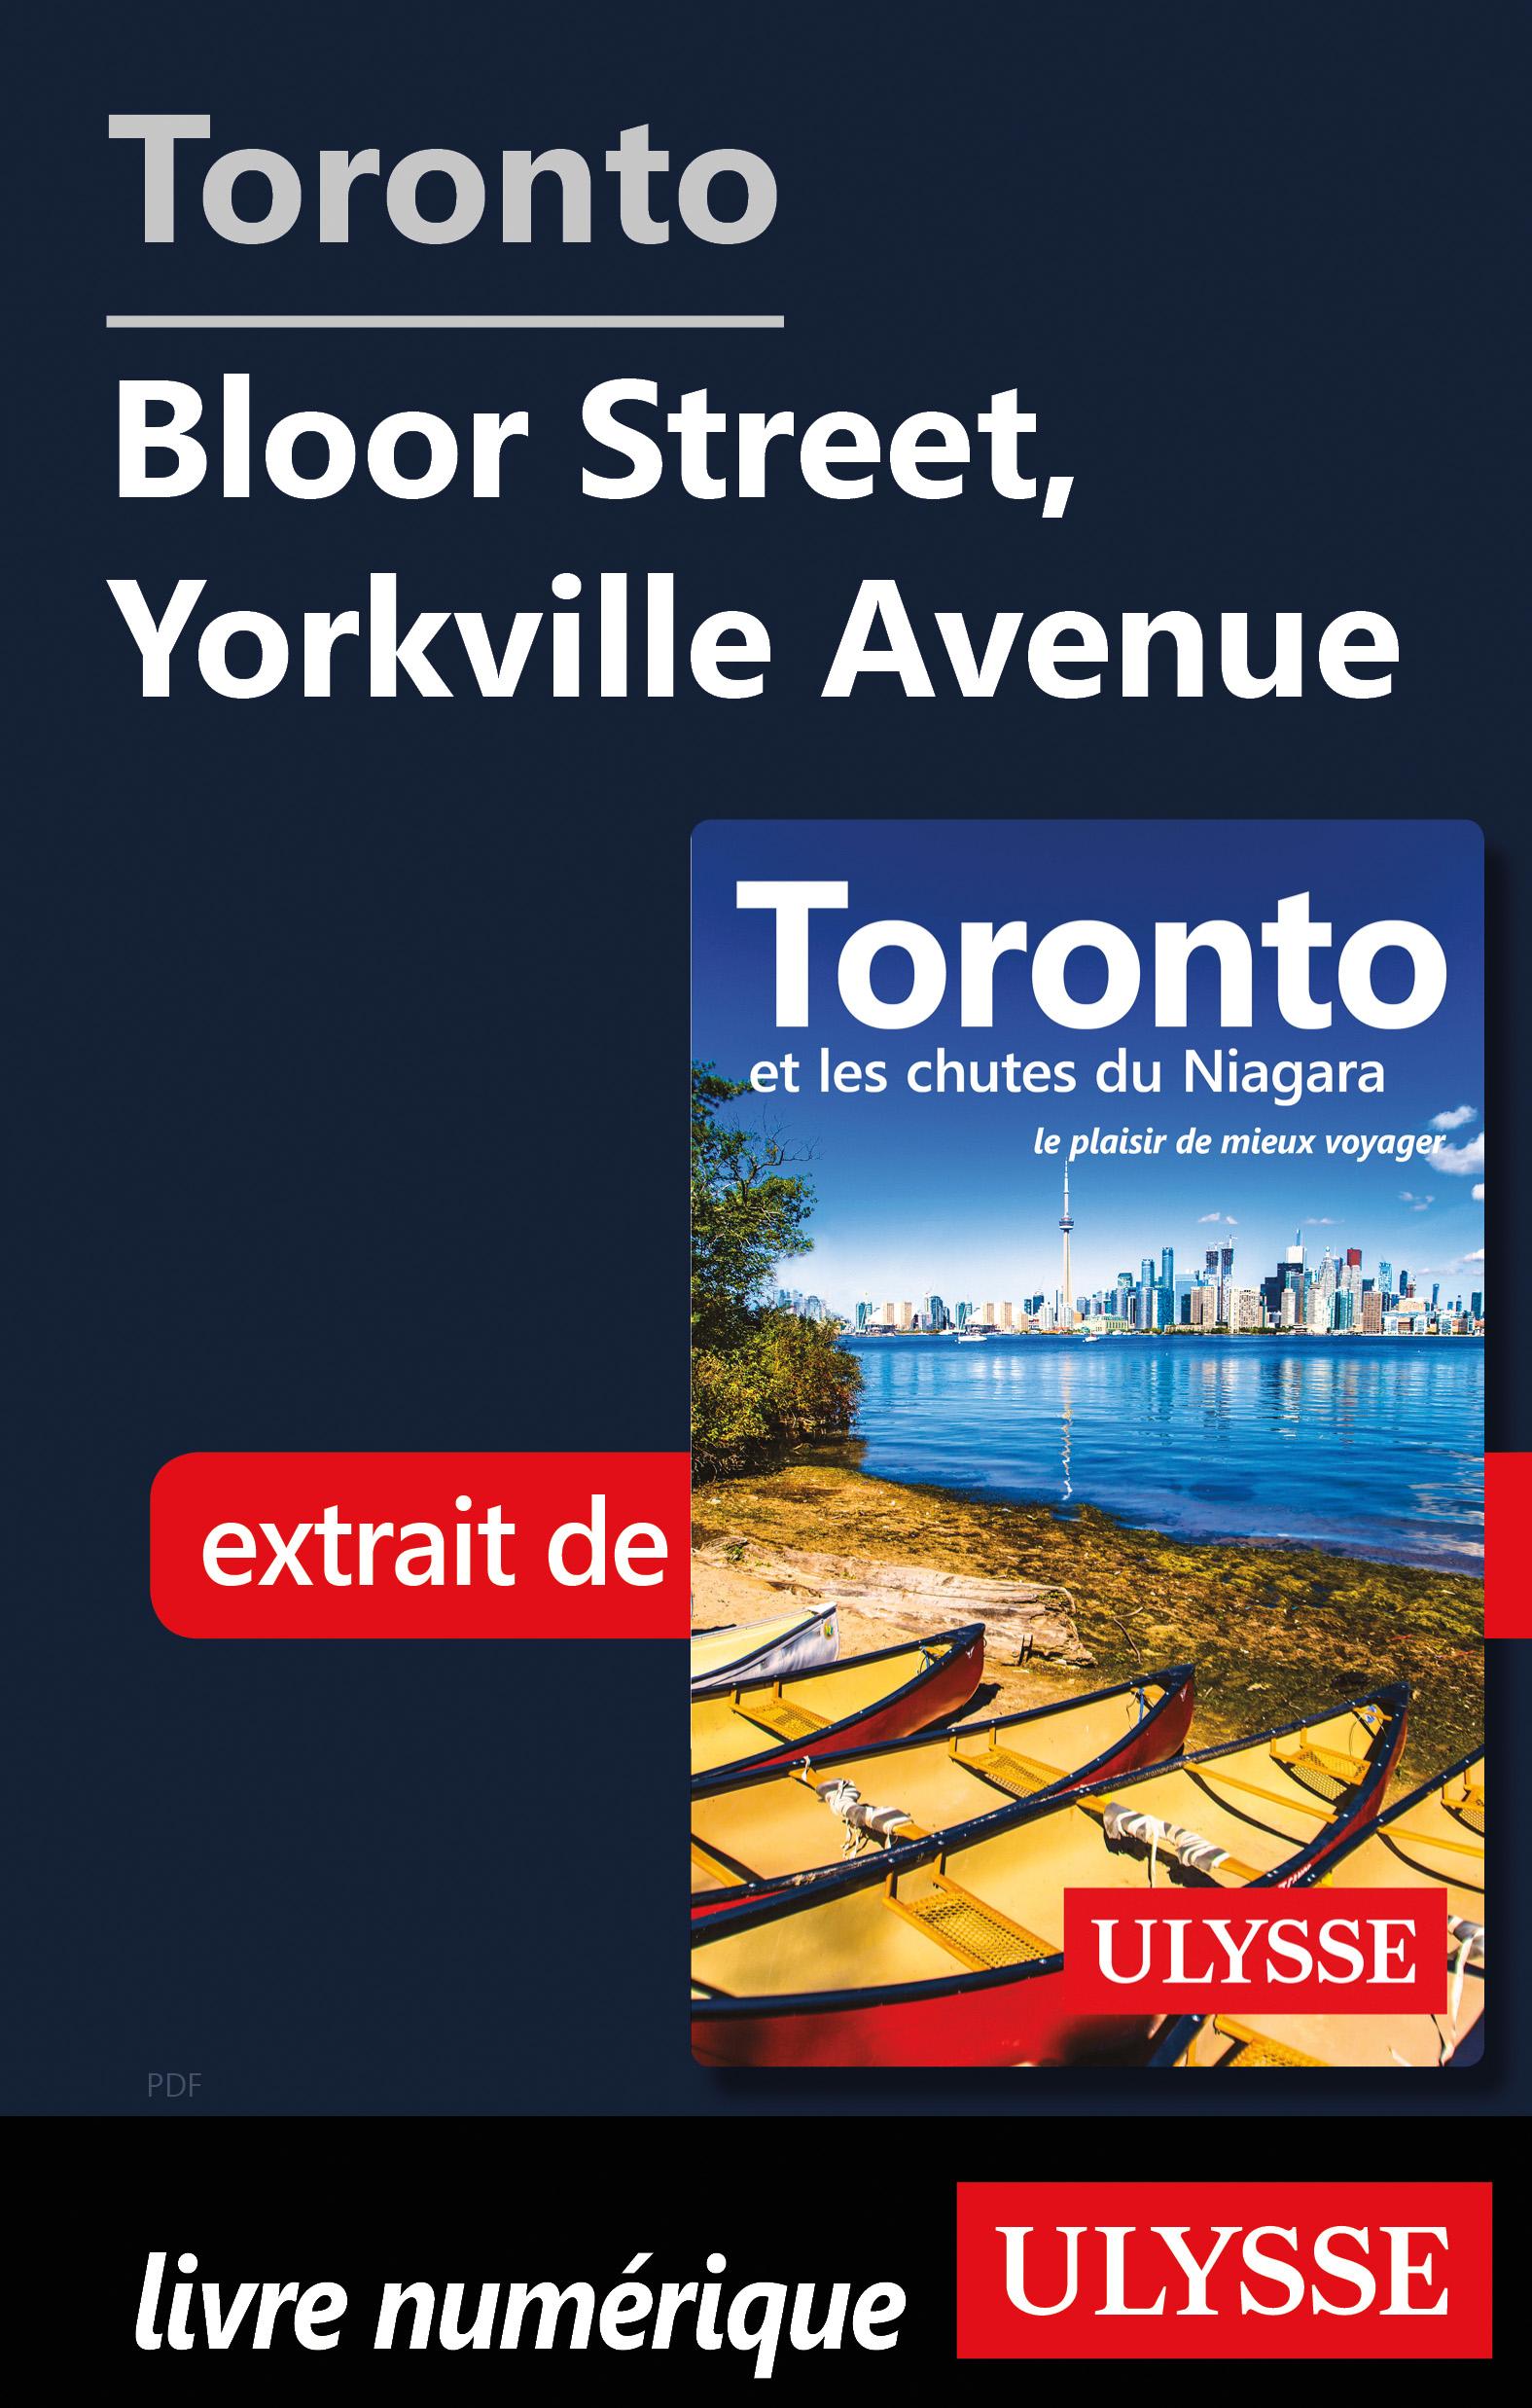 Toronto - Bloor Street, Yorkville Avenue